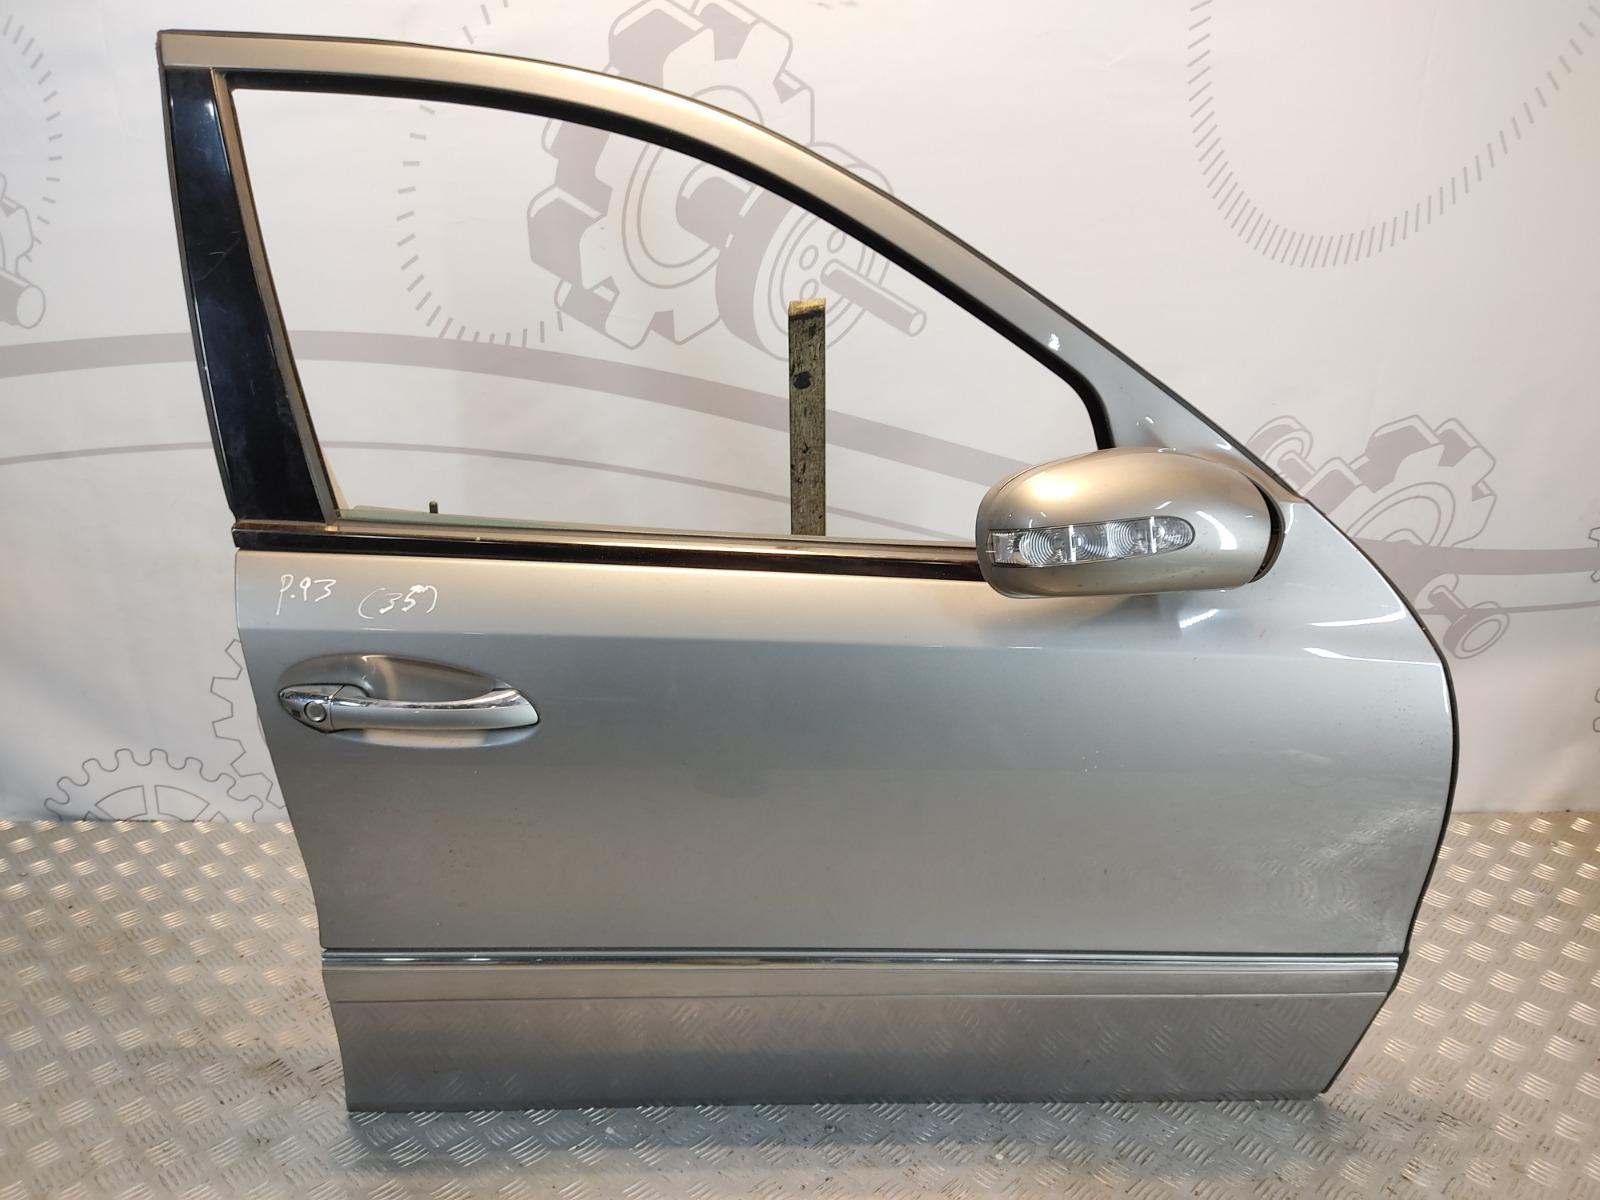 Дверь передняя правая Mercedes E W211 1.8 I 2003 (б/у)